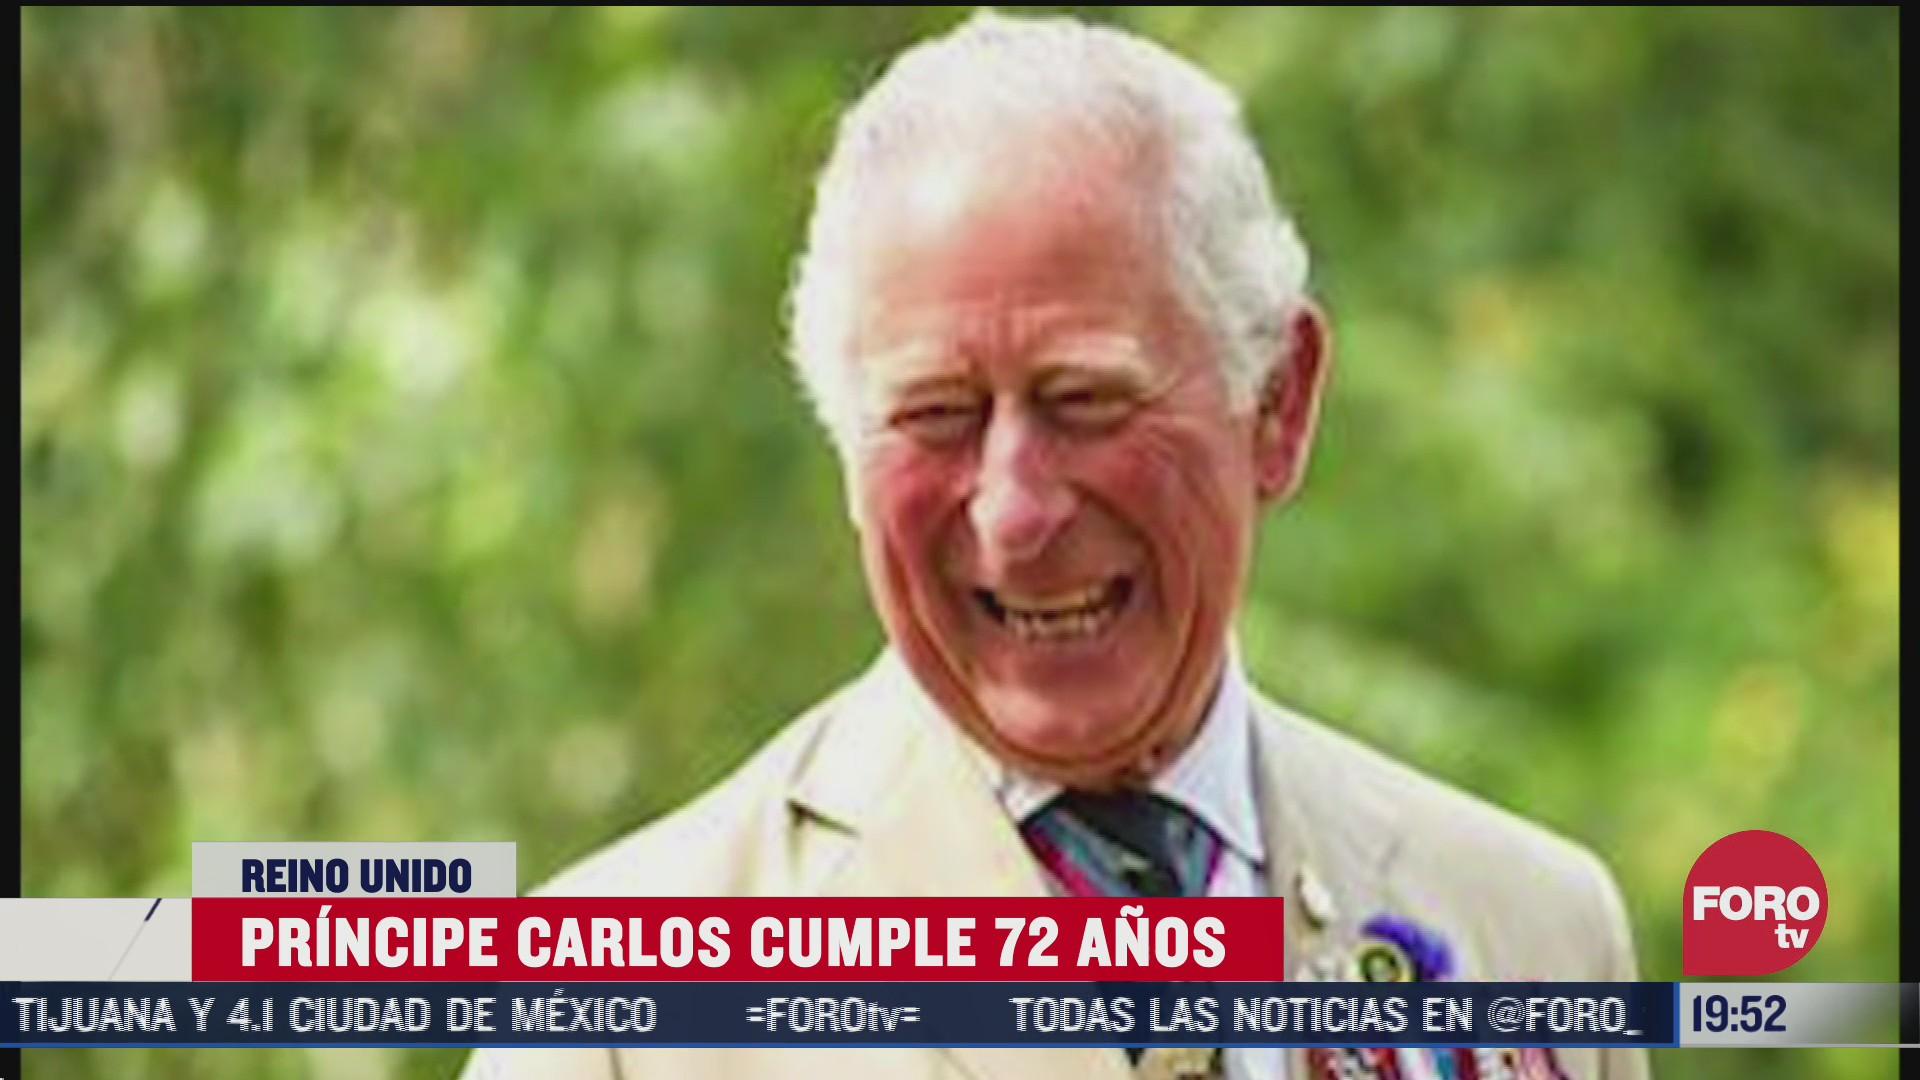 principe carlos cumple 72 anos